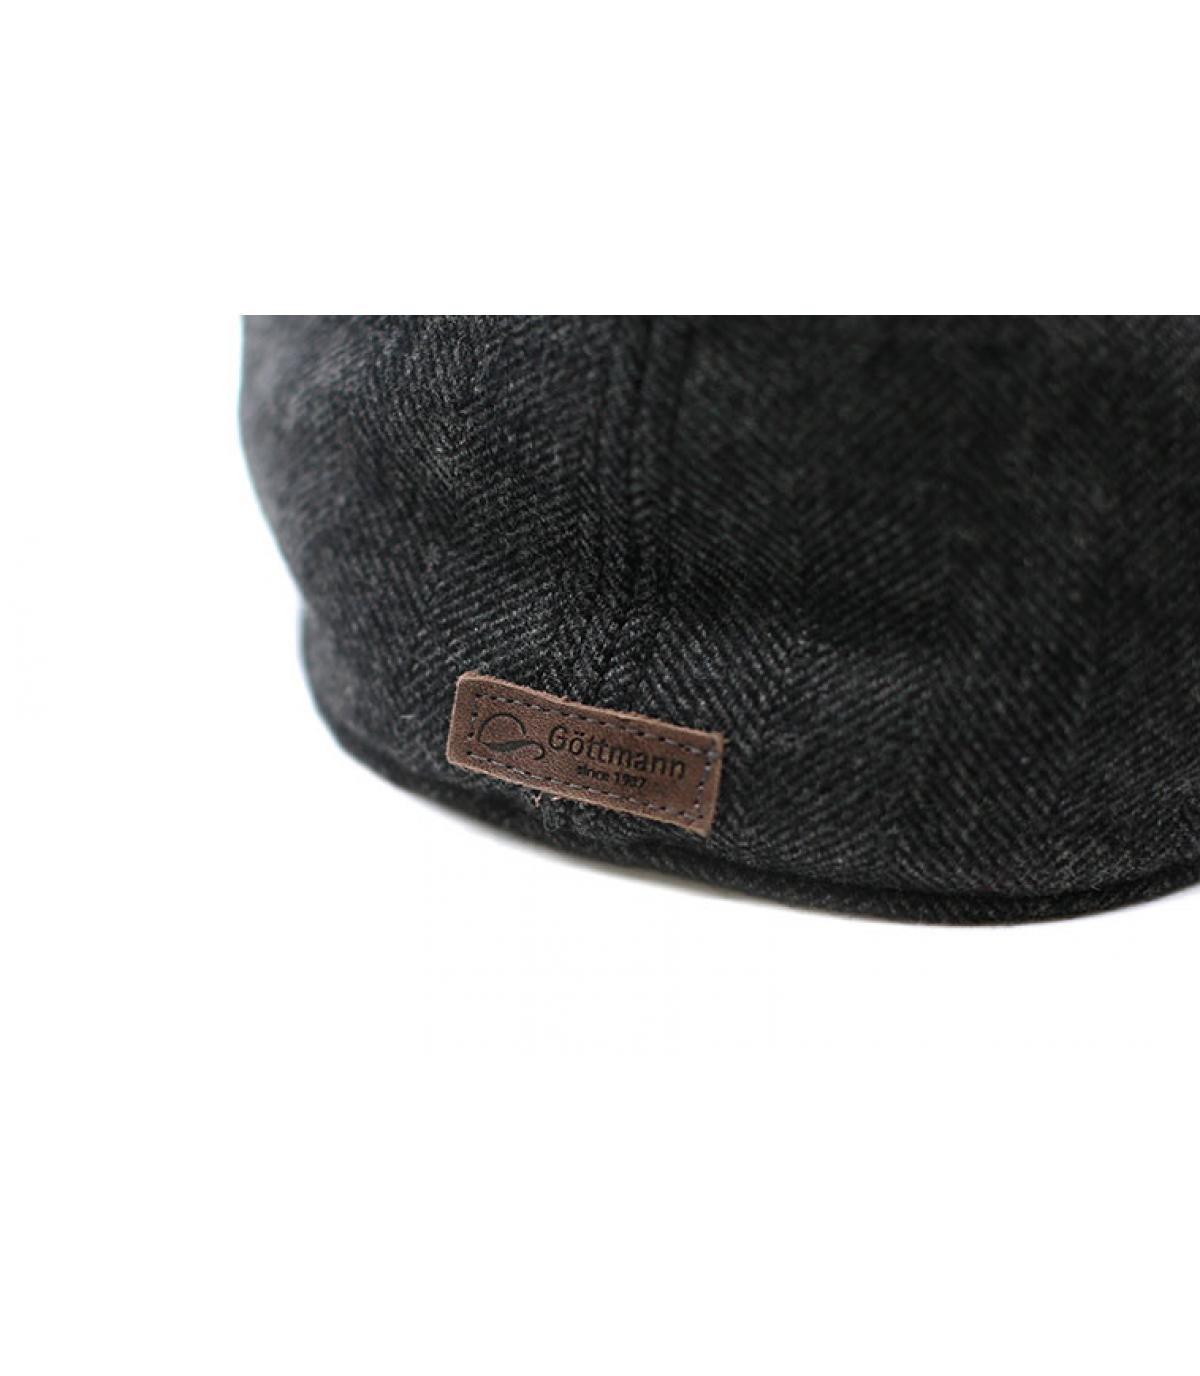 Dettagli Brentford Wool grey - image 3